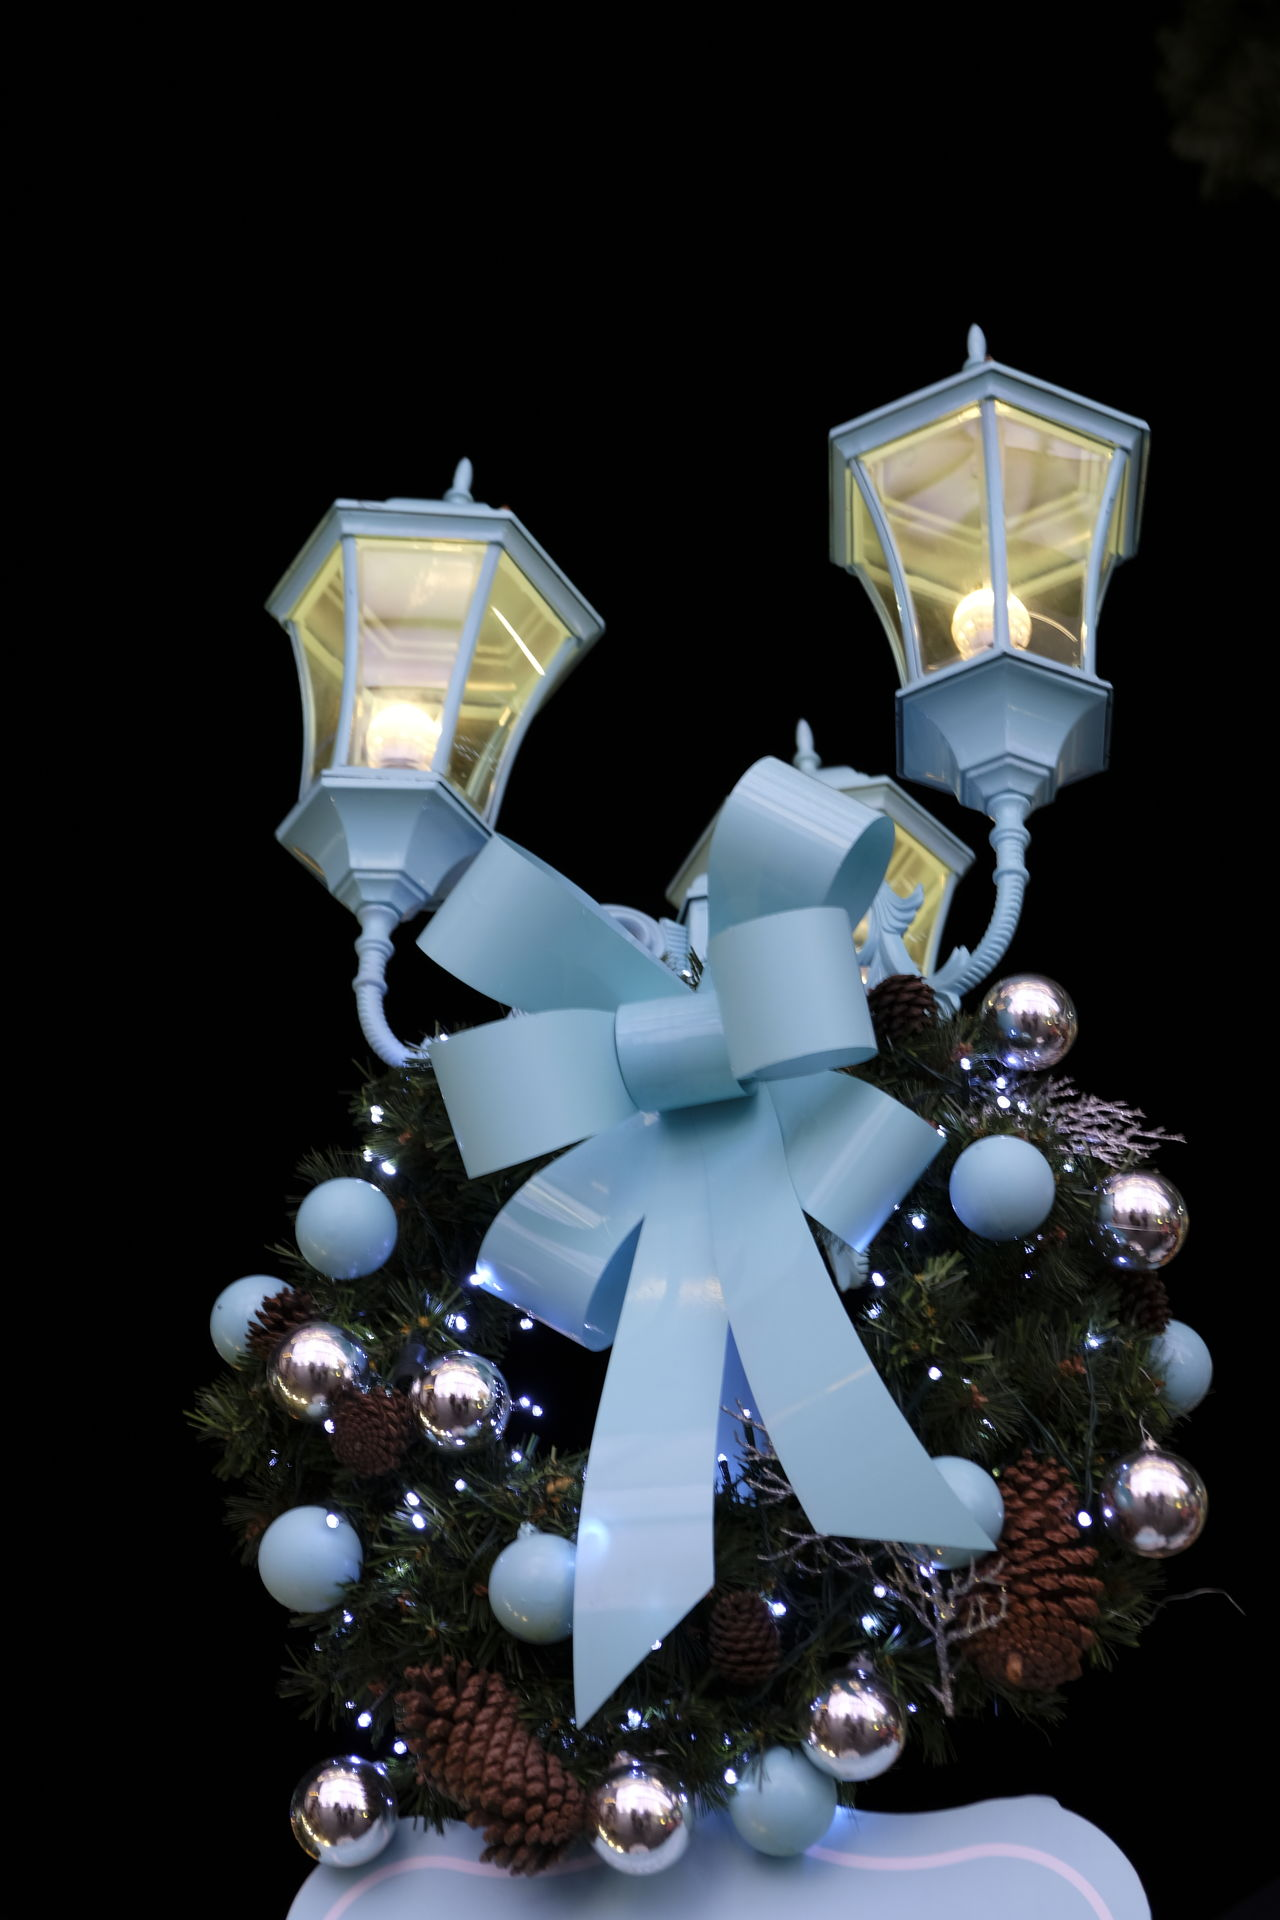 Black Background Christmas Lights Luxury Night No People Outdoor Precious Gem Wealth